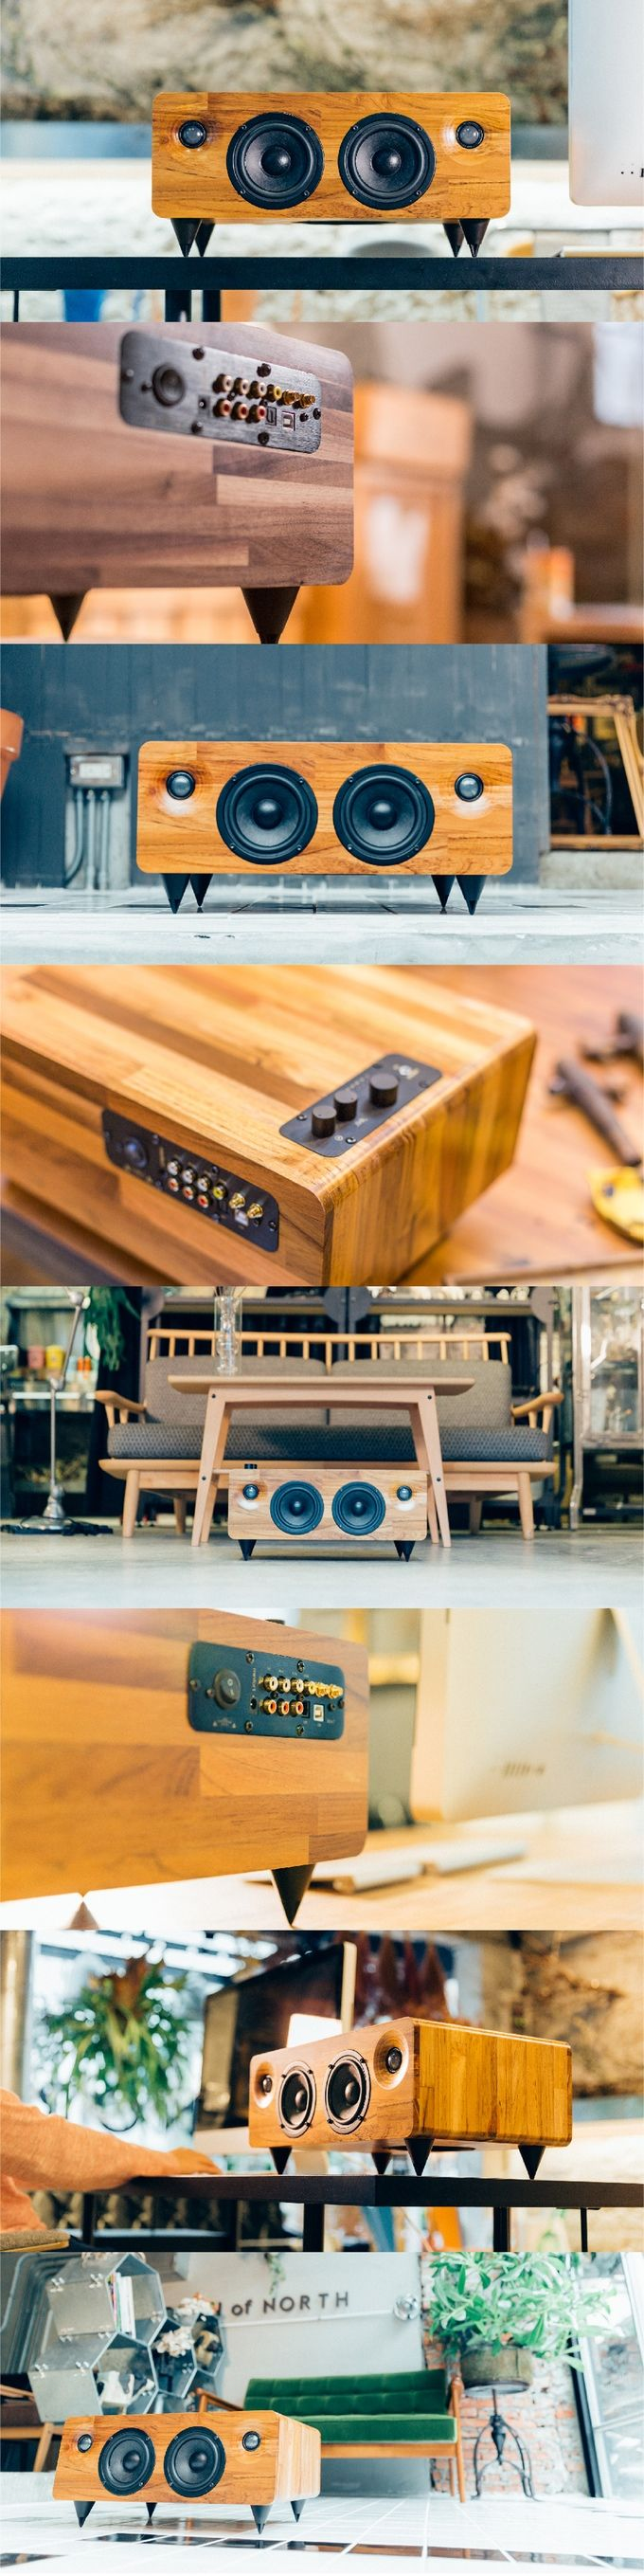 Bringing audio engineering, craftsmanship, and technology together.